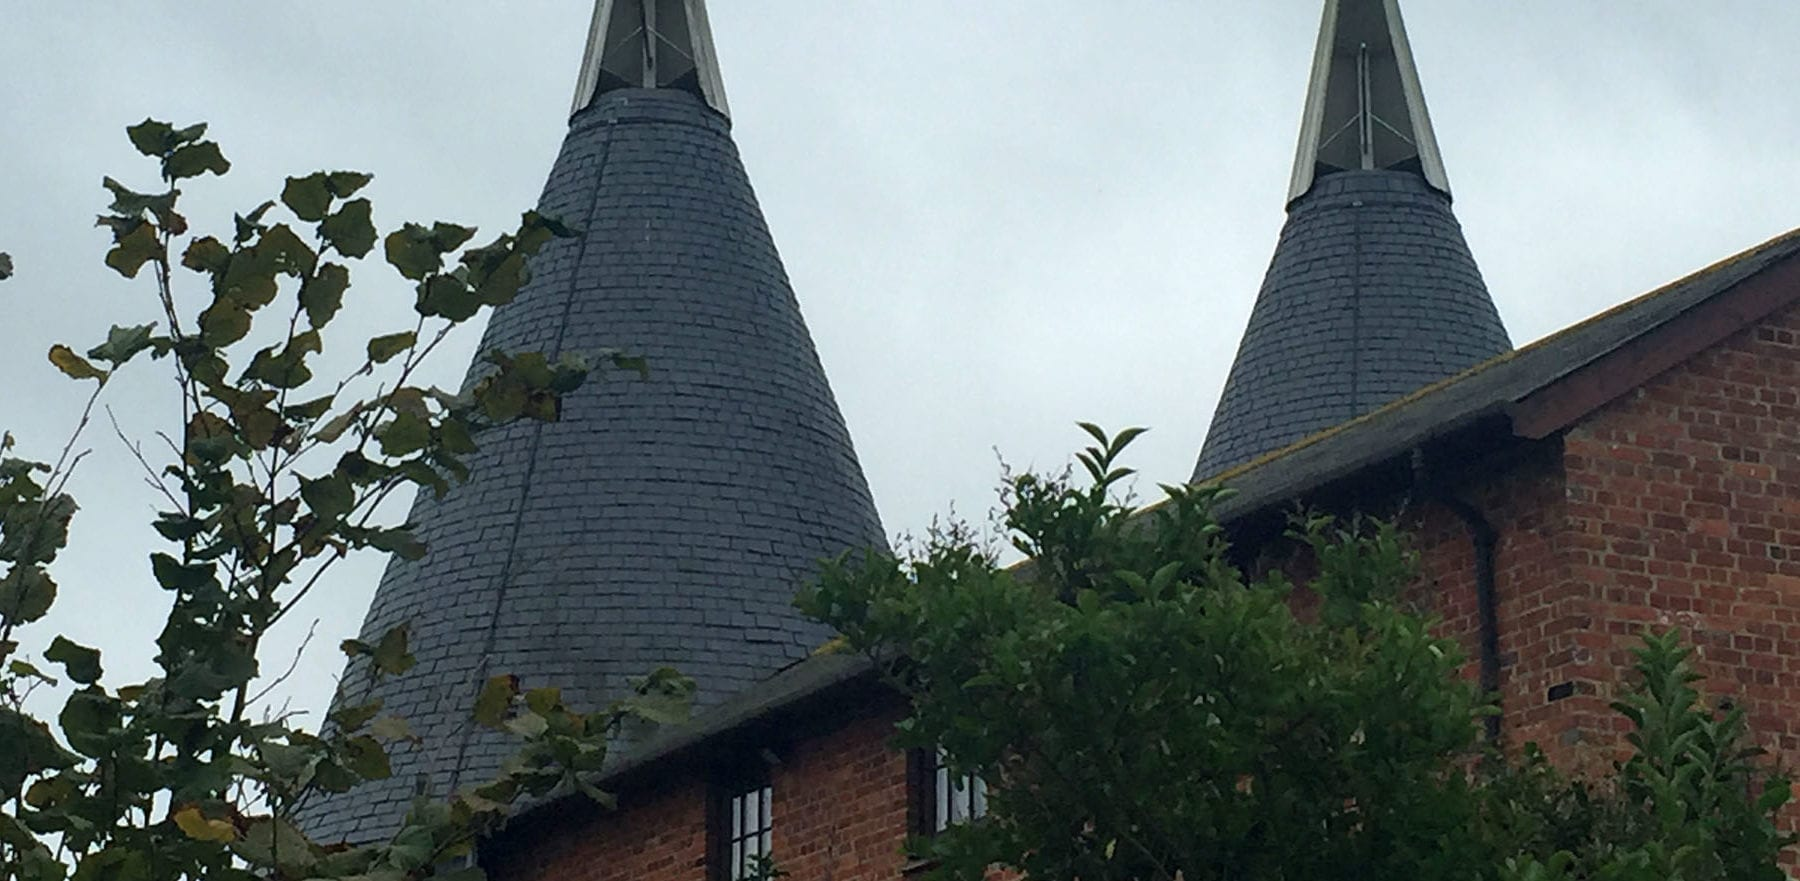 Lifestiles - Spanish Natural Slate Roof Tiles - Kent Oasts, England 3